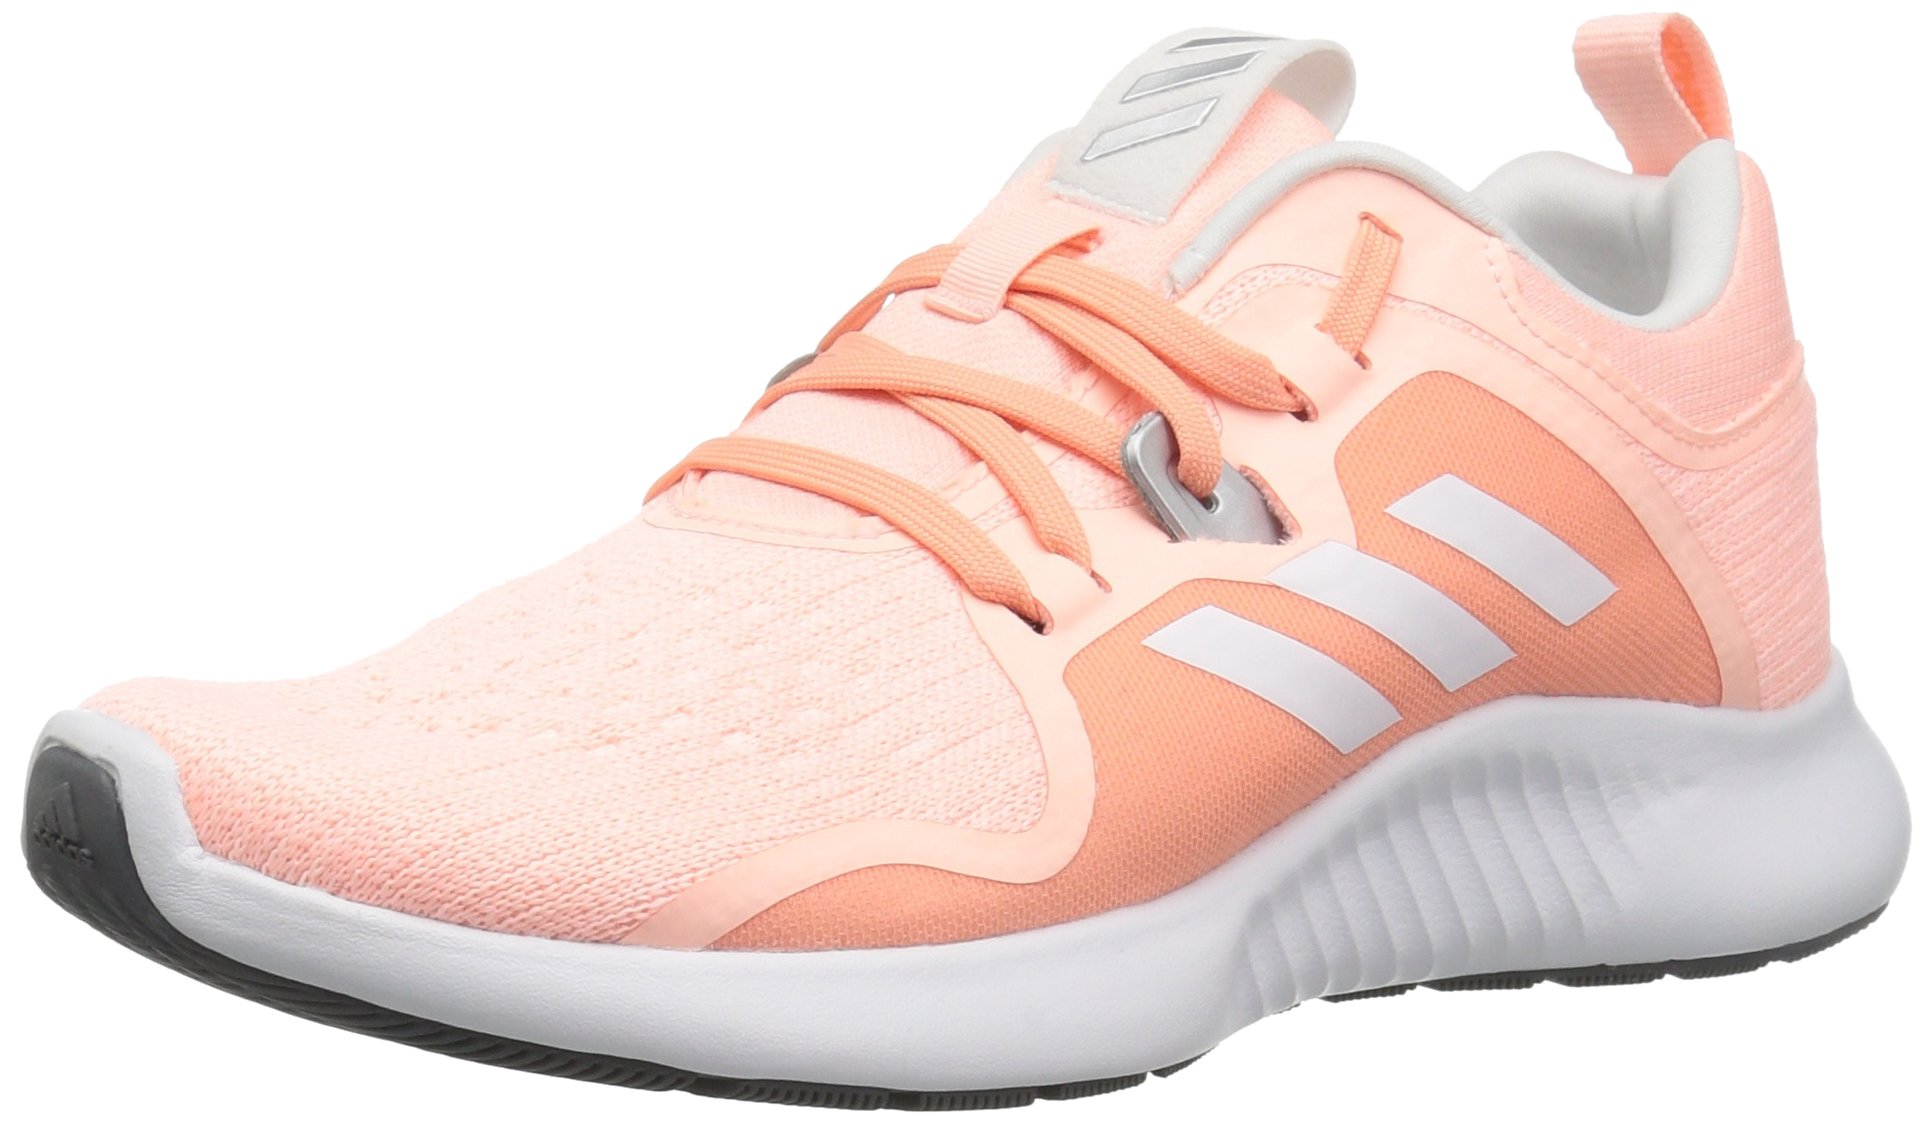 adidas Women's EdgeBounce Running Shoe, Clear Orange/White/Copper Metallic, 5 M US